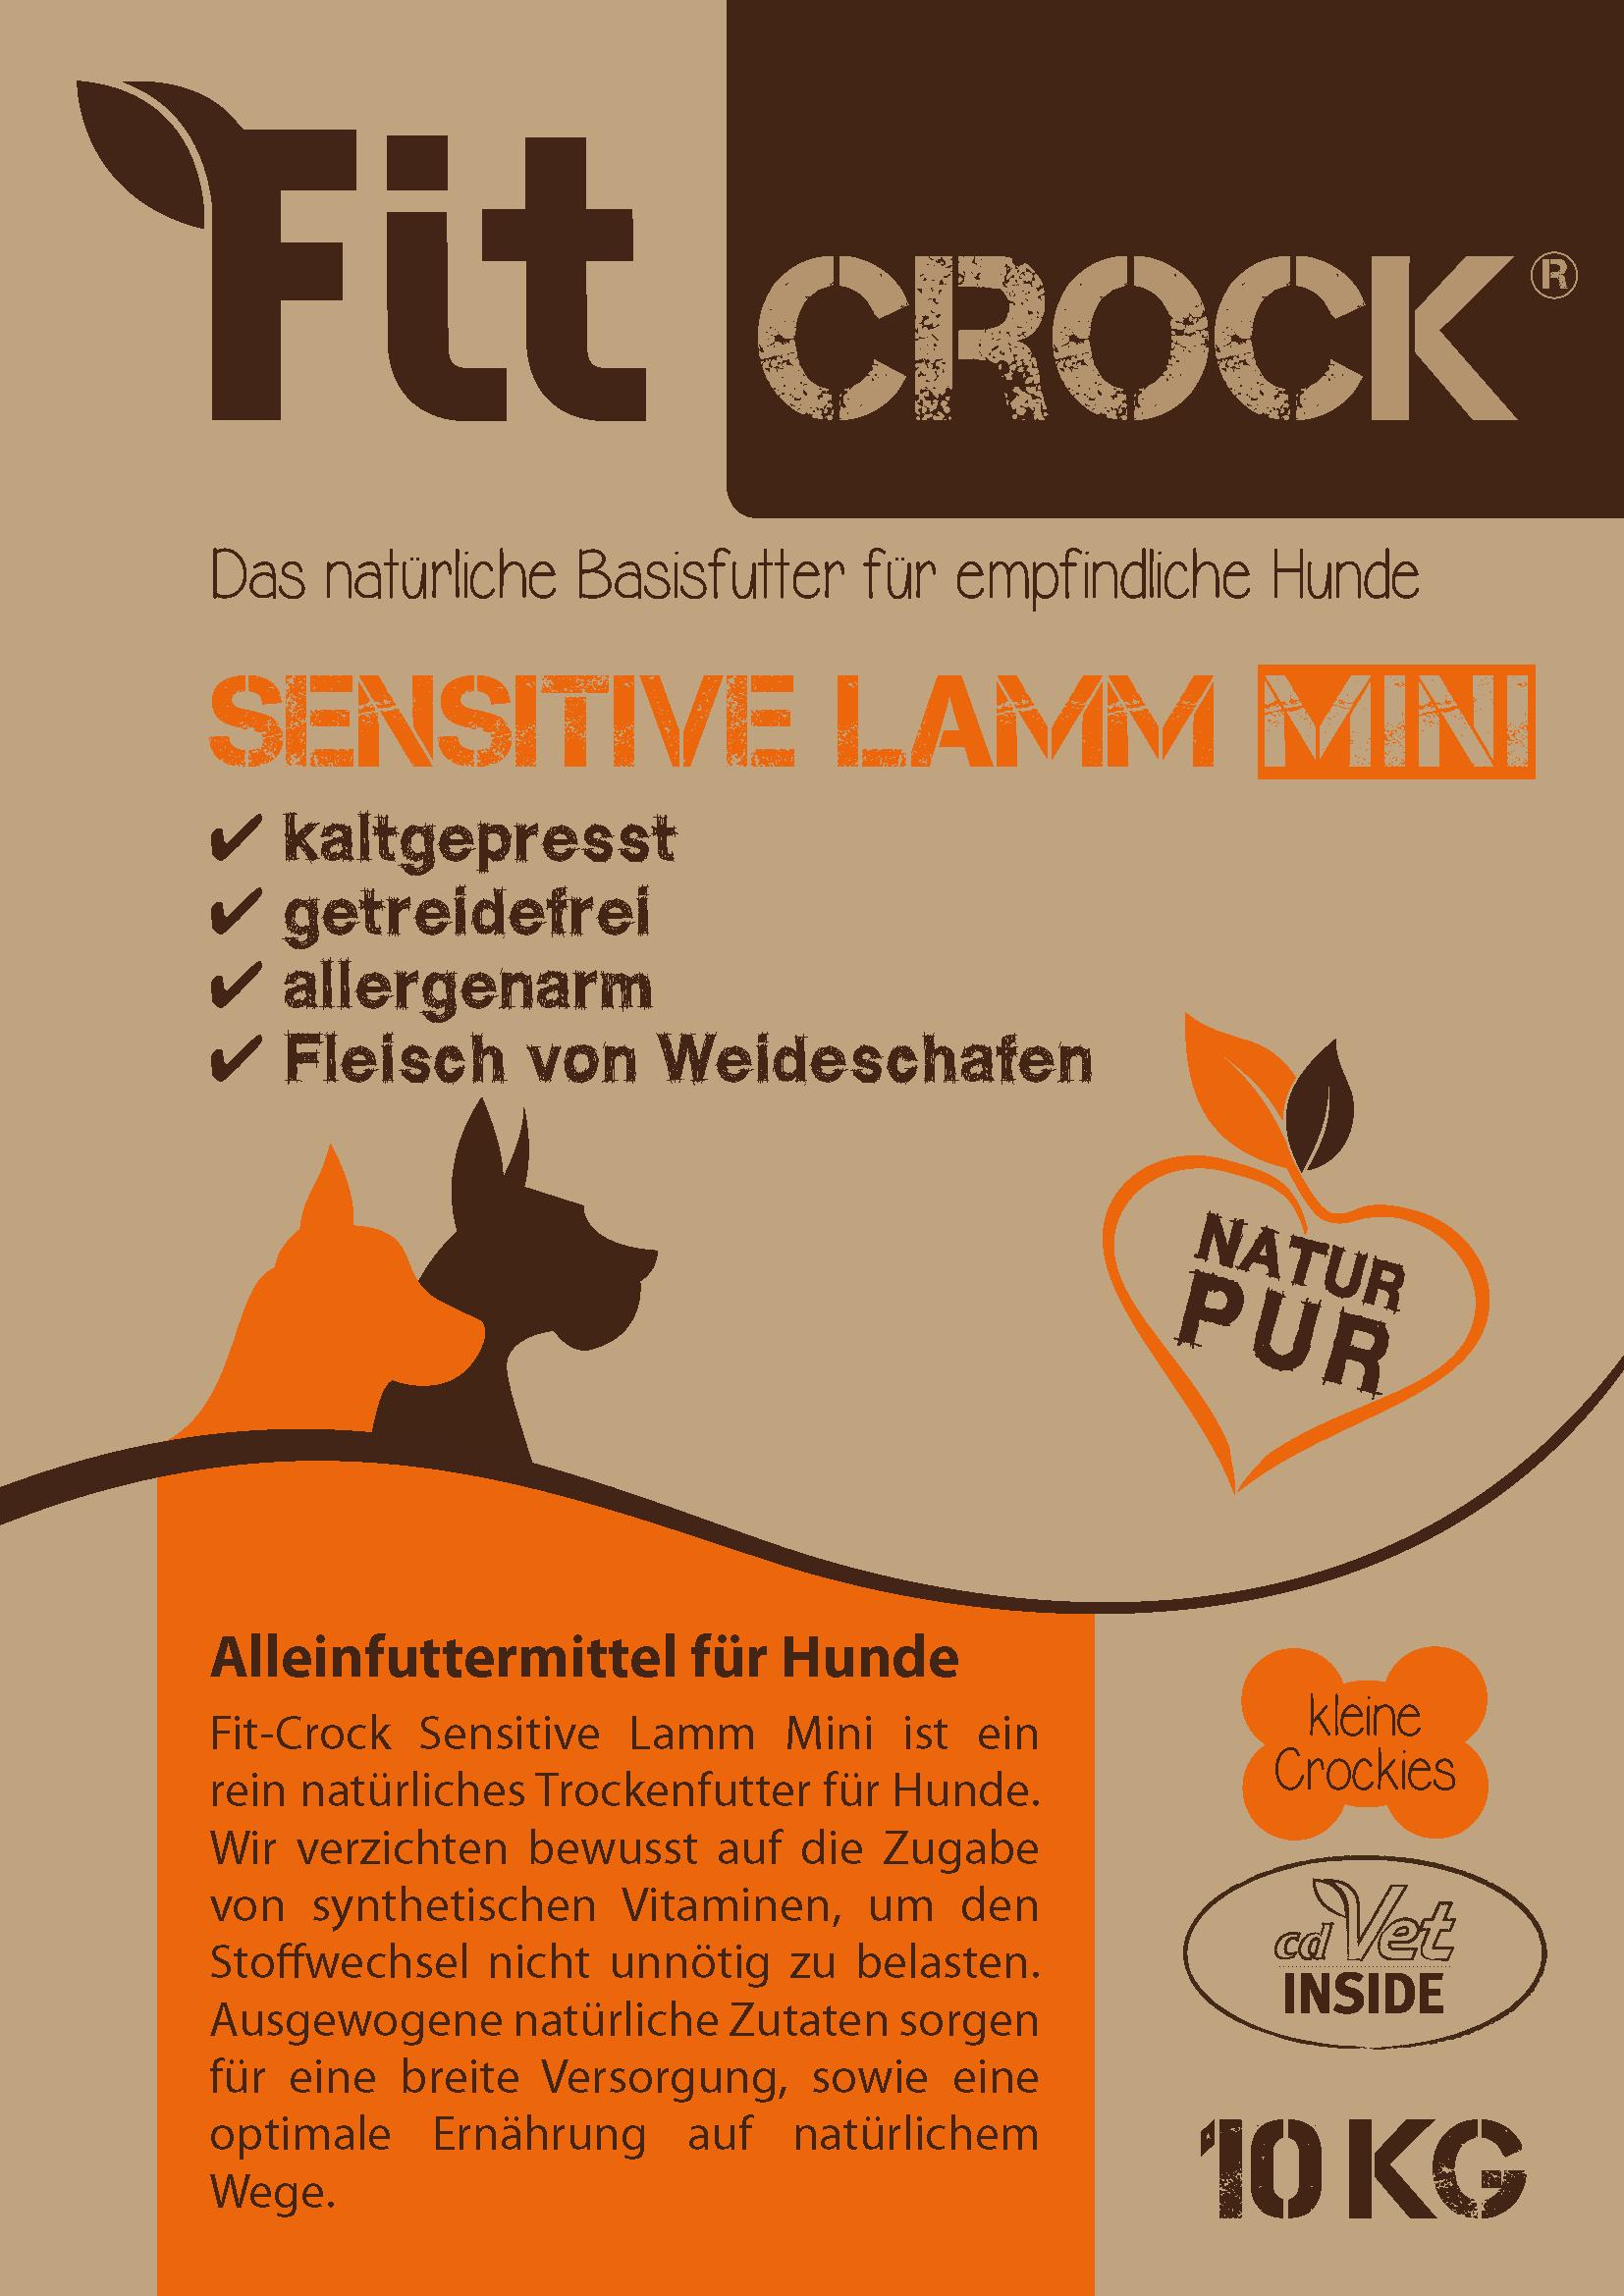 Fit-Crock Sensitive Lamm Mini 10 kg